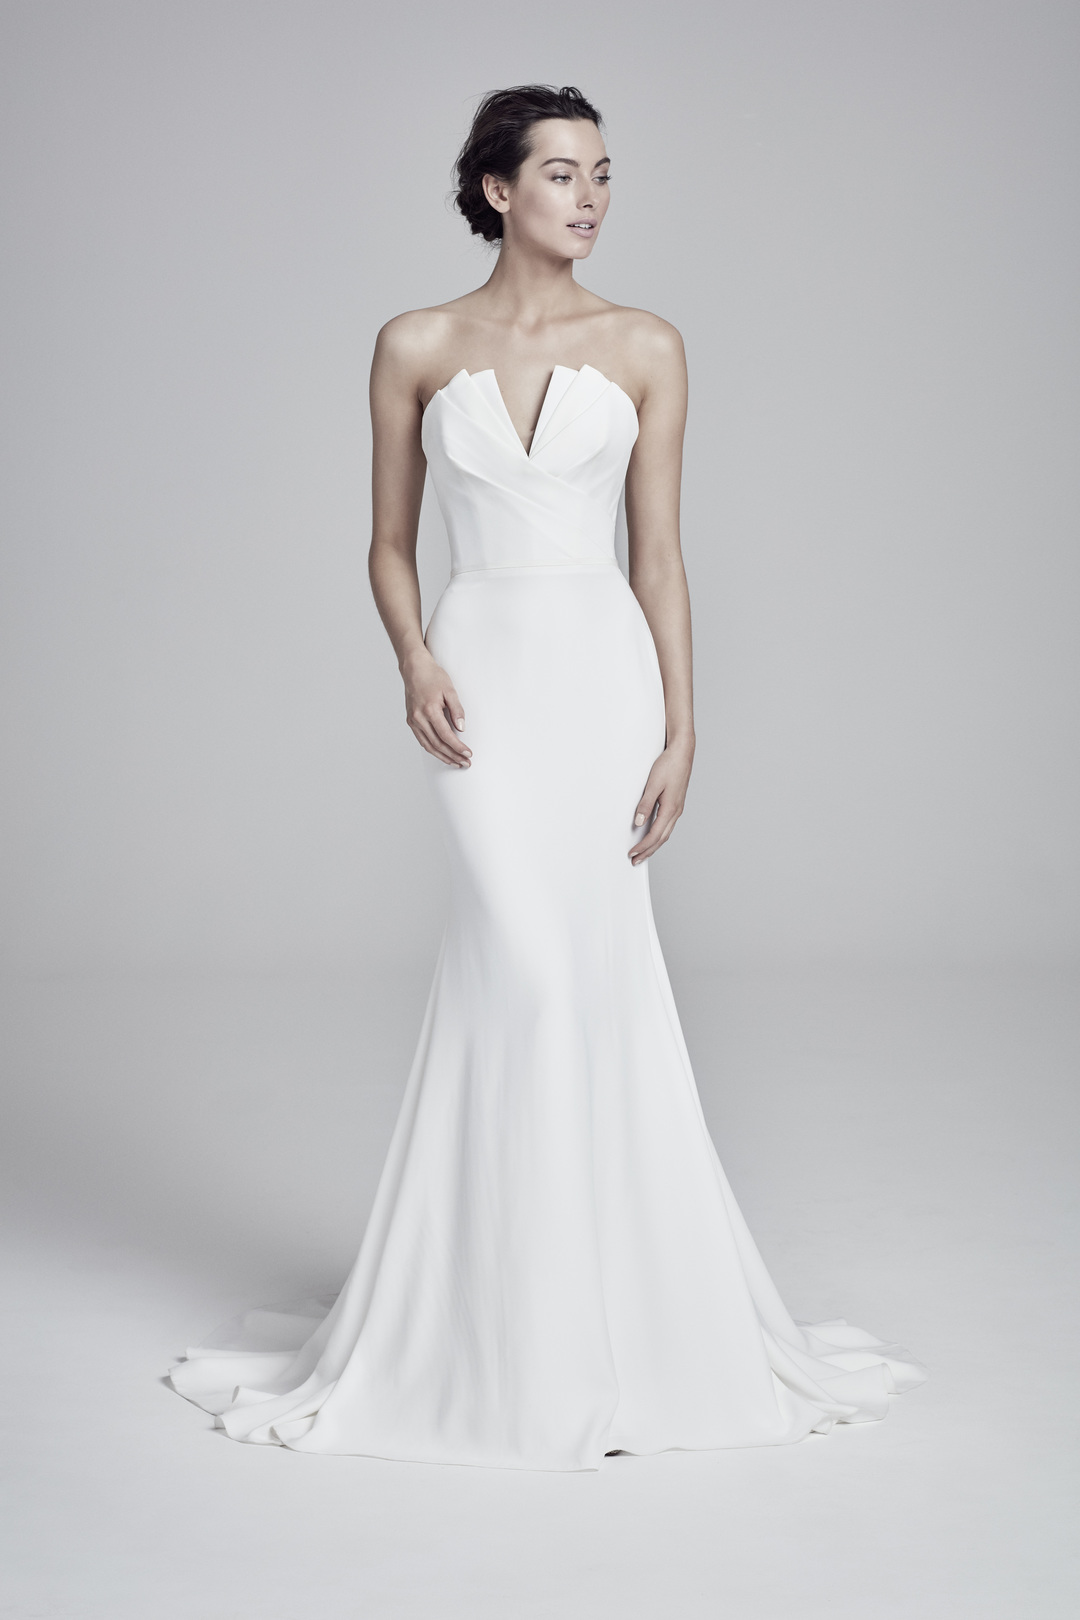 carmella  dress photo